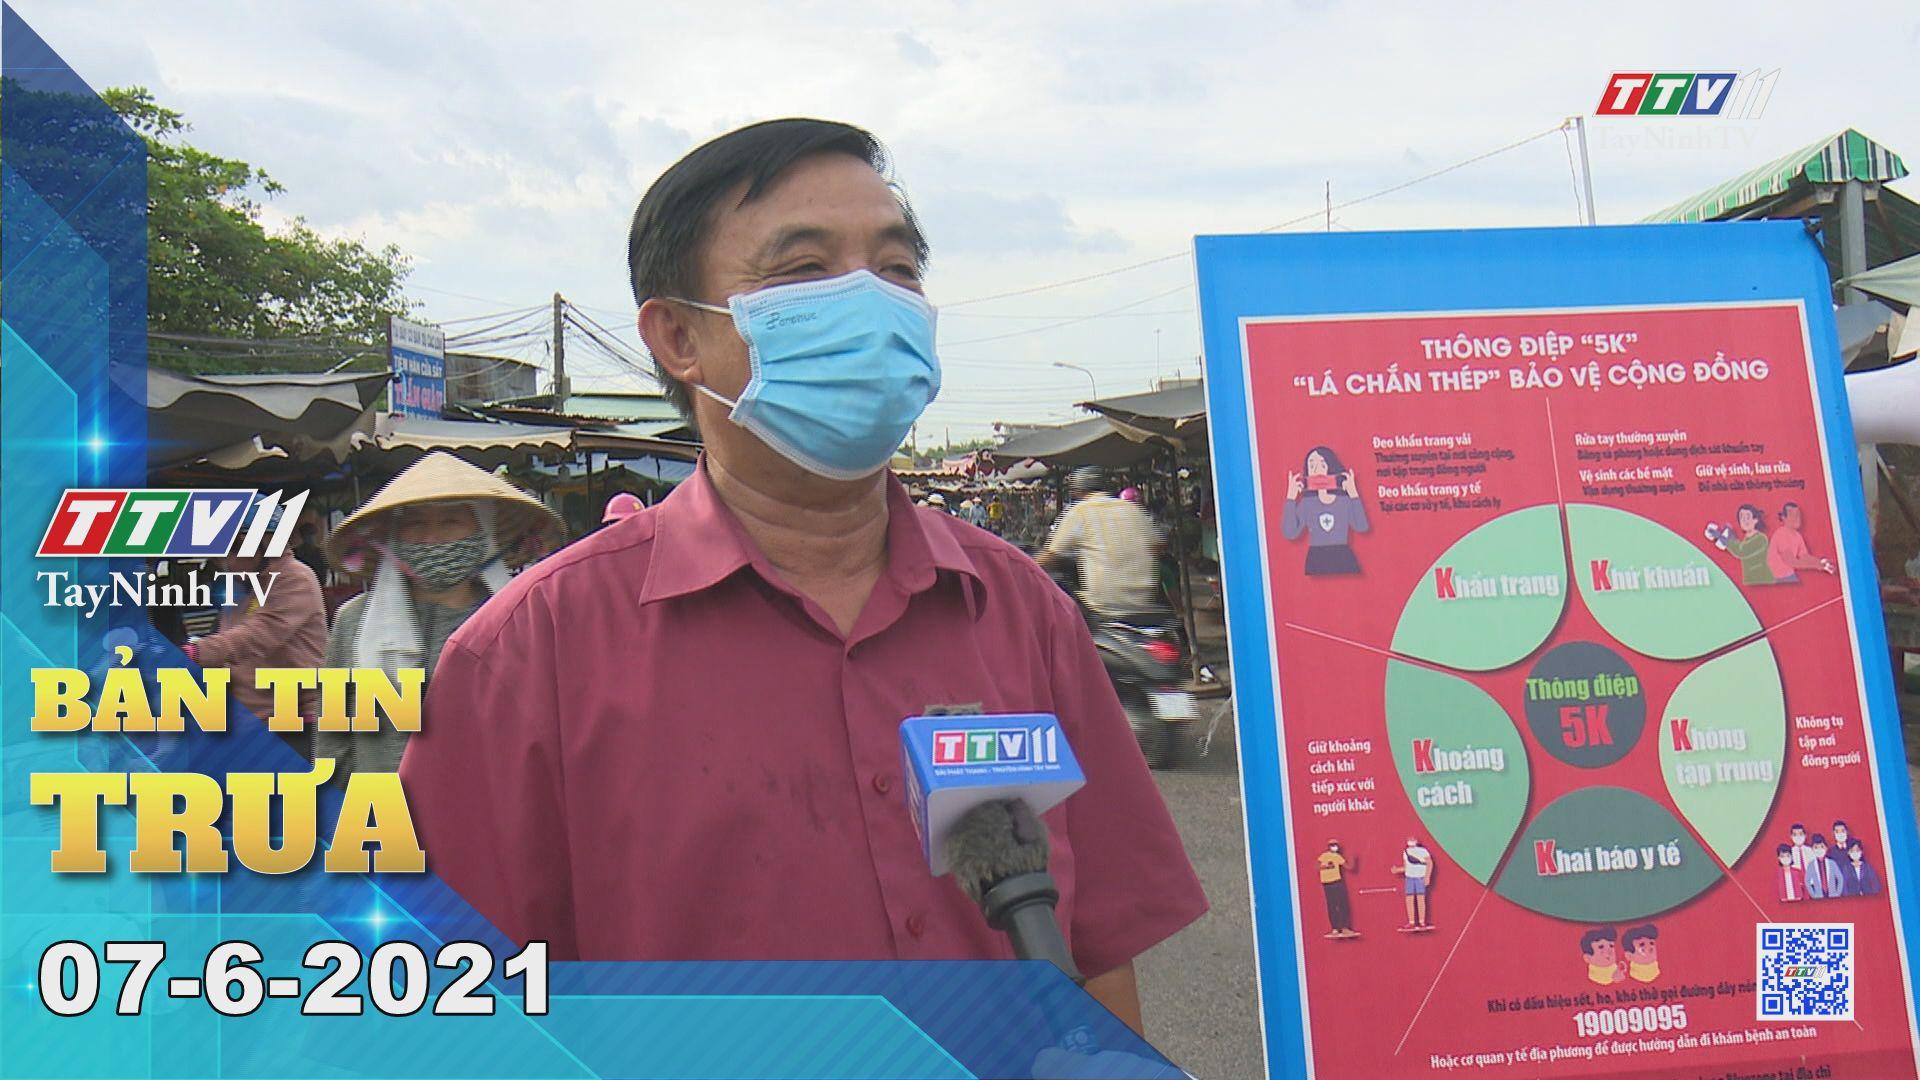 Bản tin trưa 07-6-2021 | Tin tức hôm nay | TayNinhTV